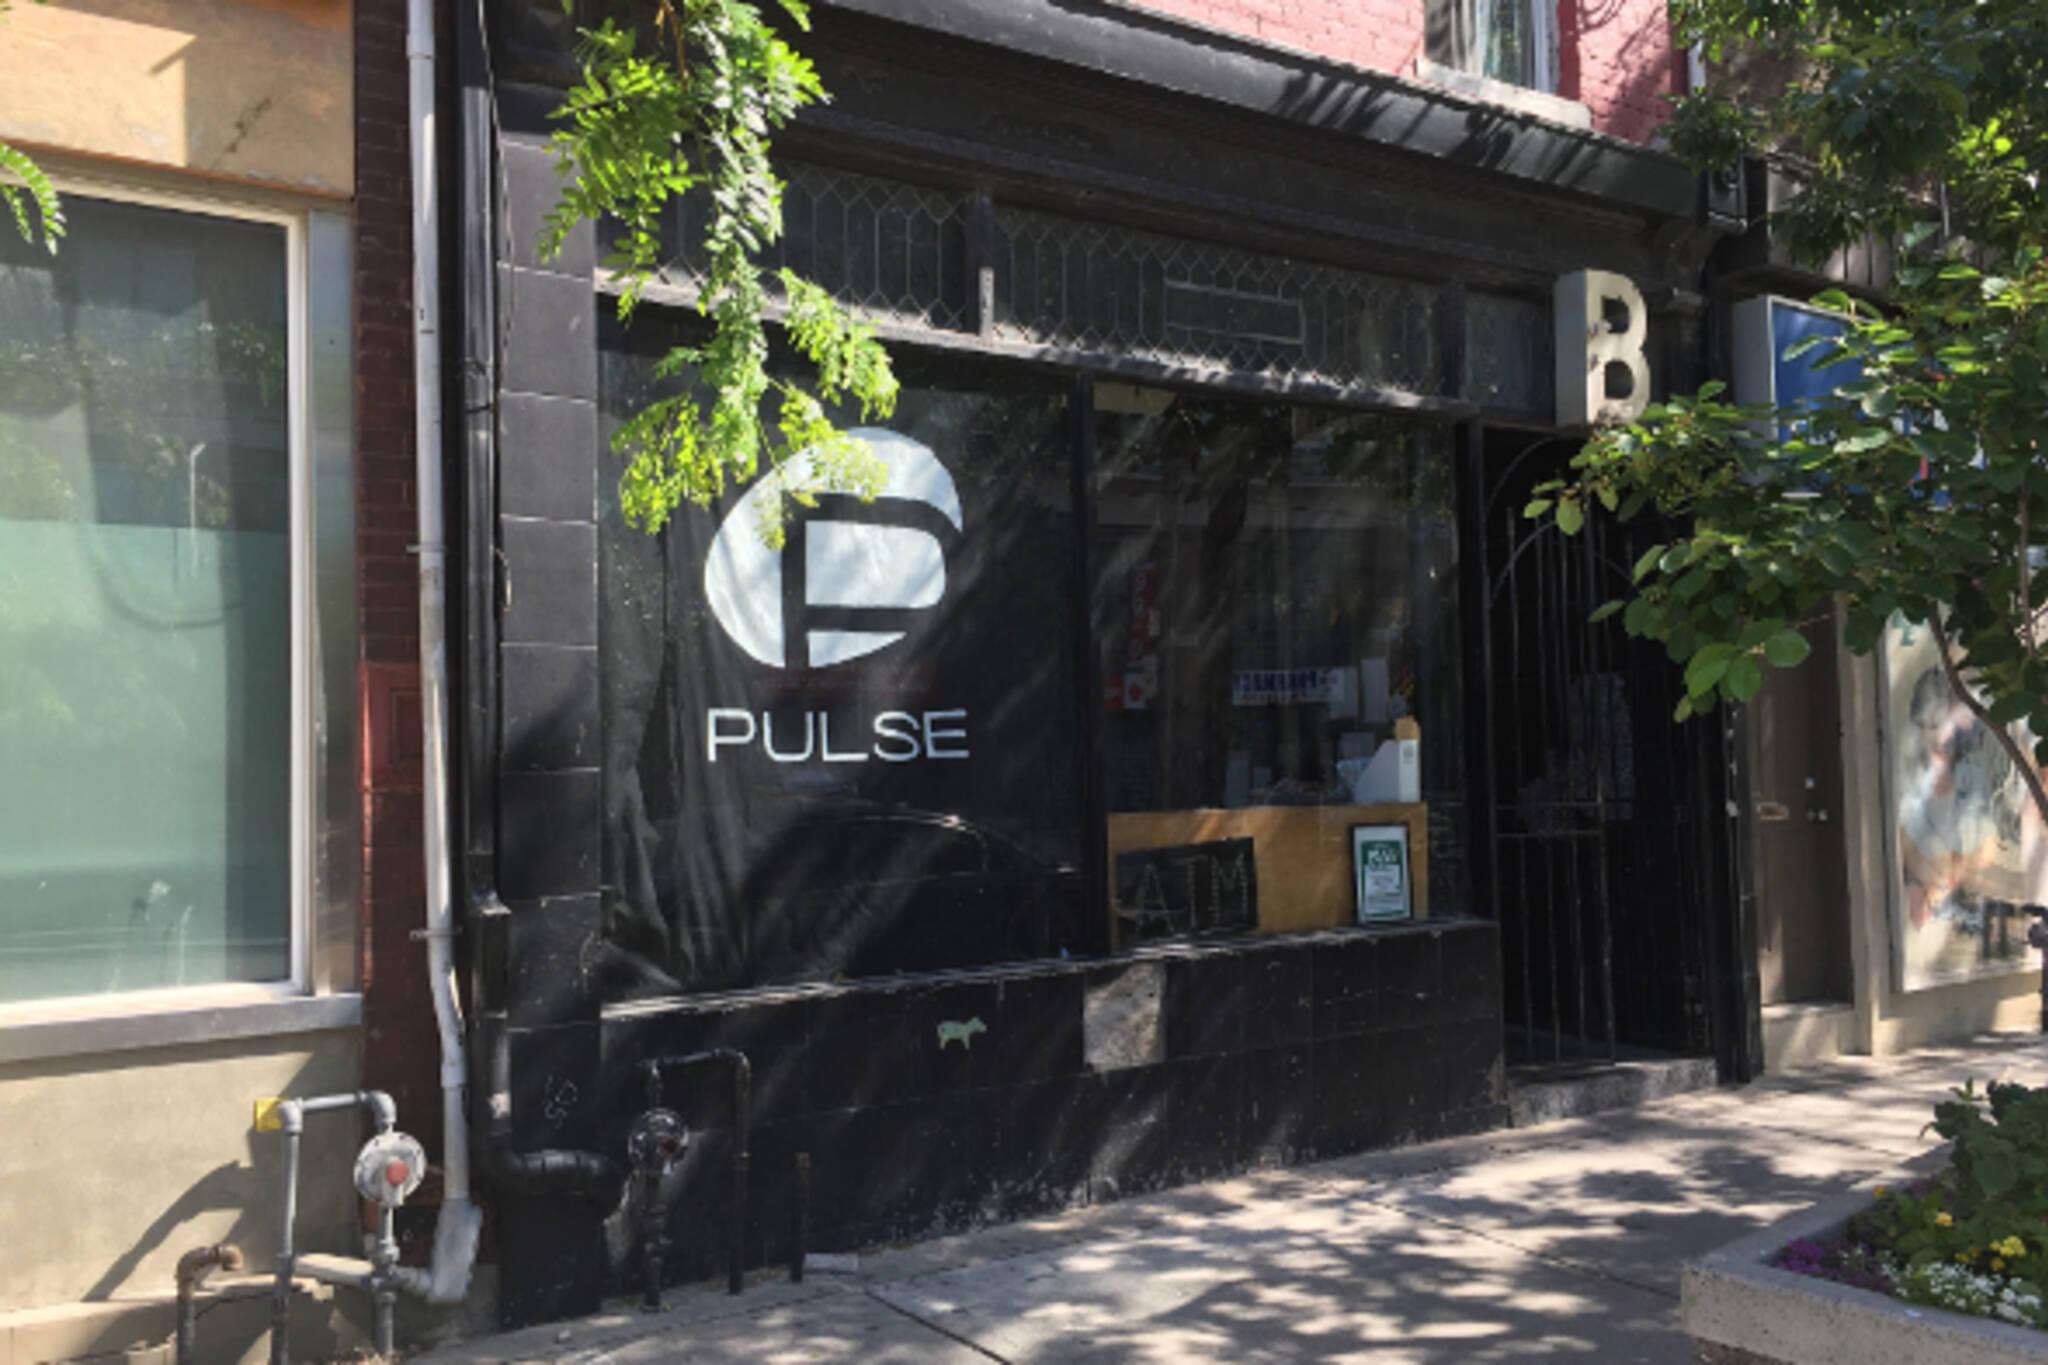 Toronto pulse nightclub